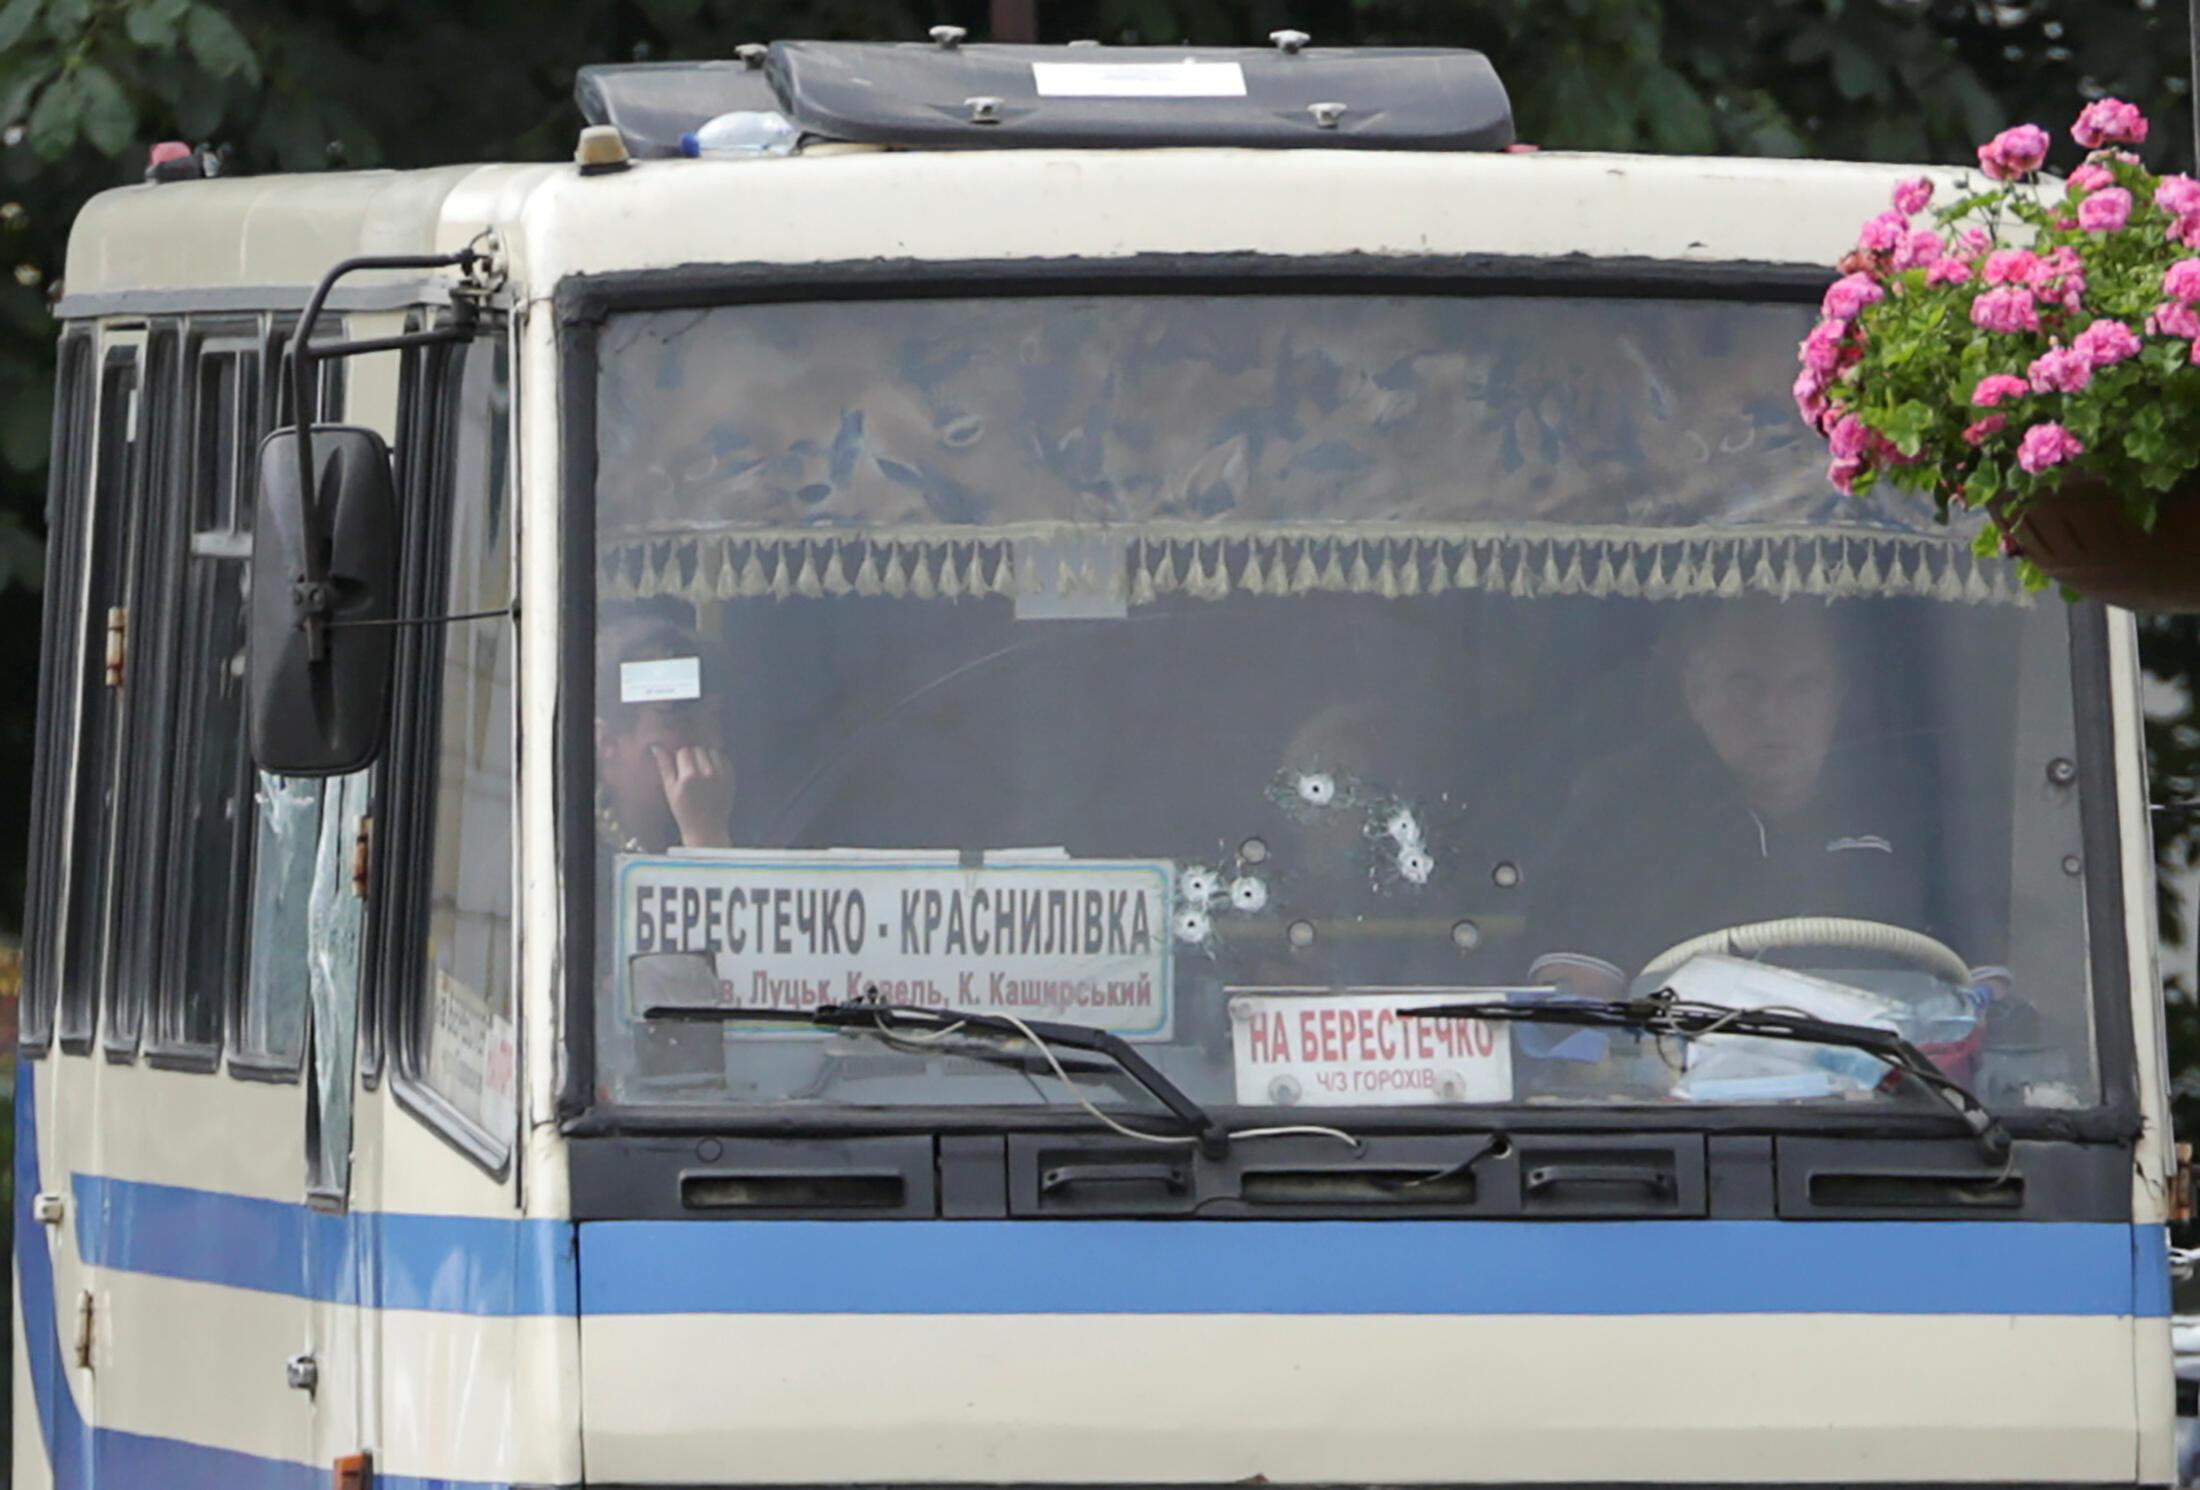 2020-07-21T105403Z_67778915_RC2MXH9AT7WC_RTRMADP_3_UKRAINE-HOSTAGES